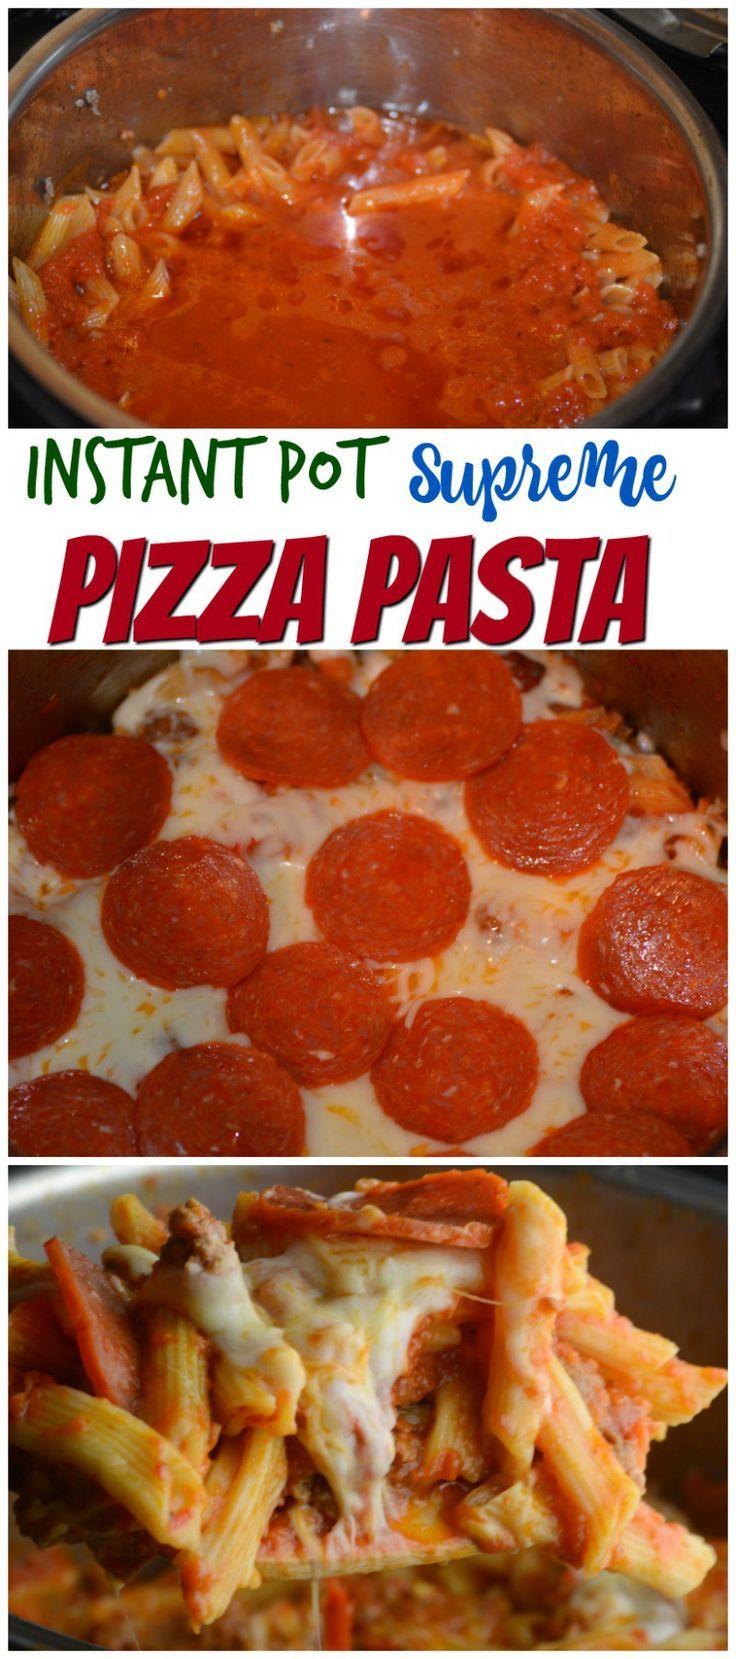 Instant Pot Supreme Pizza Pasta Recipe Insta Pot